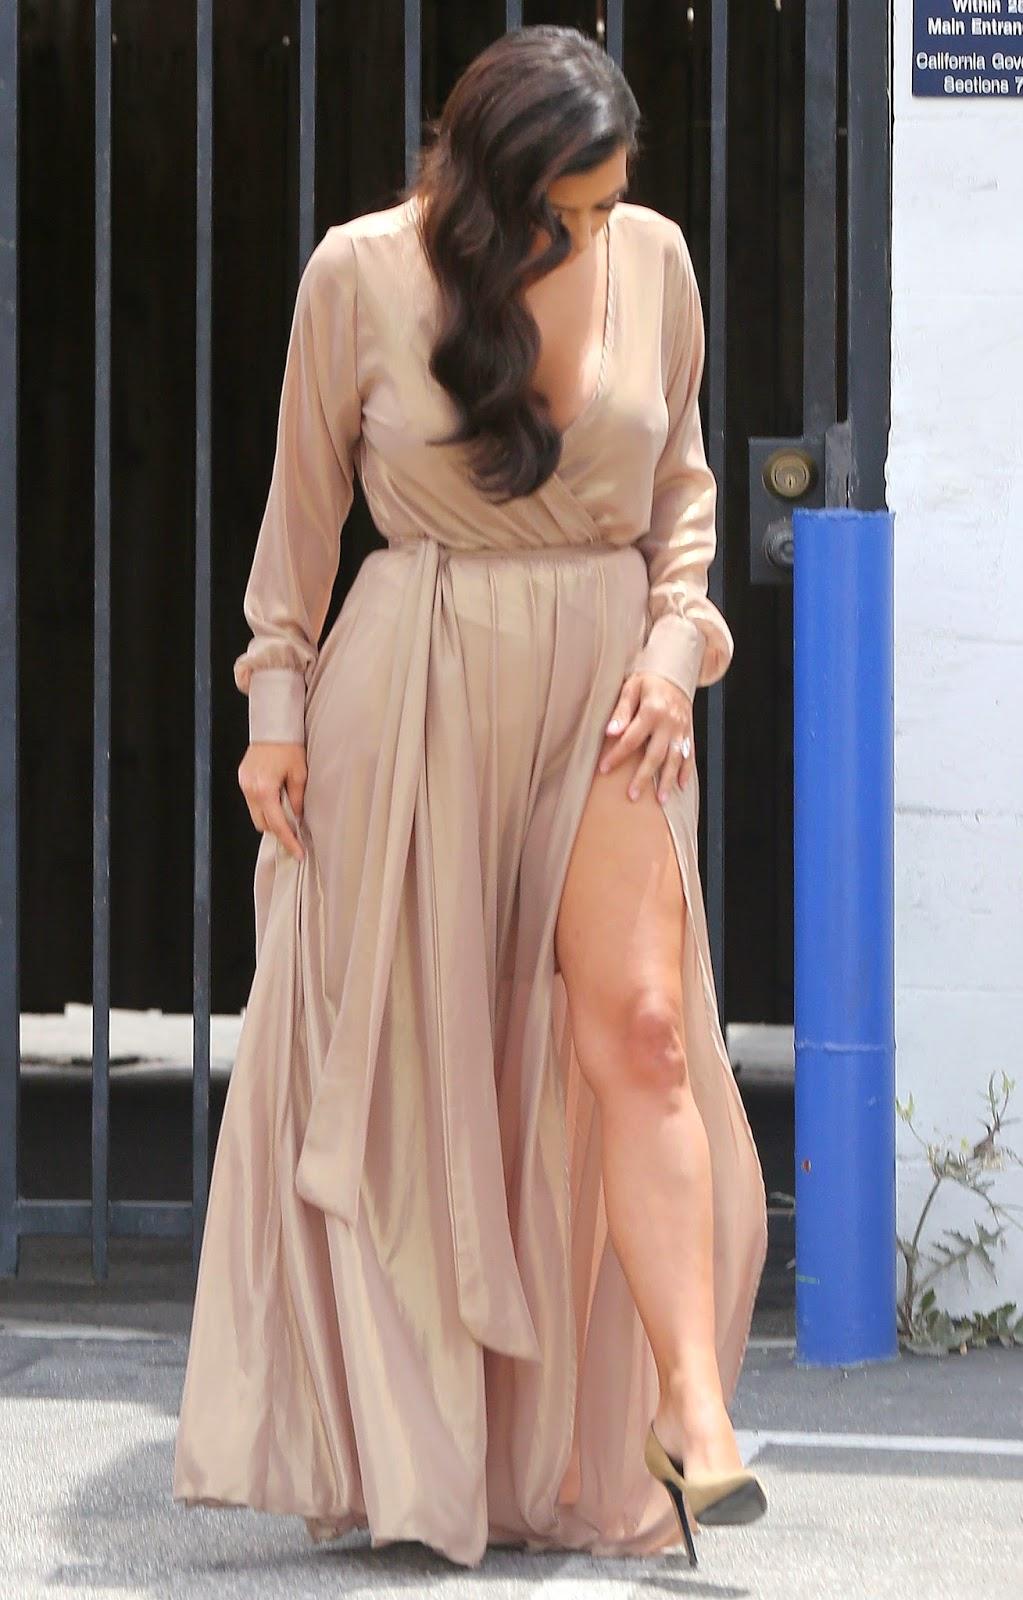 Indian Girl Full Hd Wallpaper Kim Kardashian Hot Cleavage And Legs Show Gallery